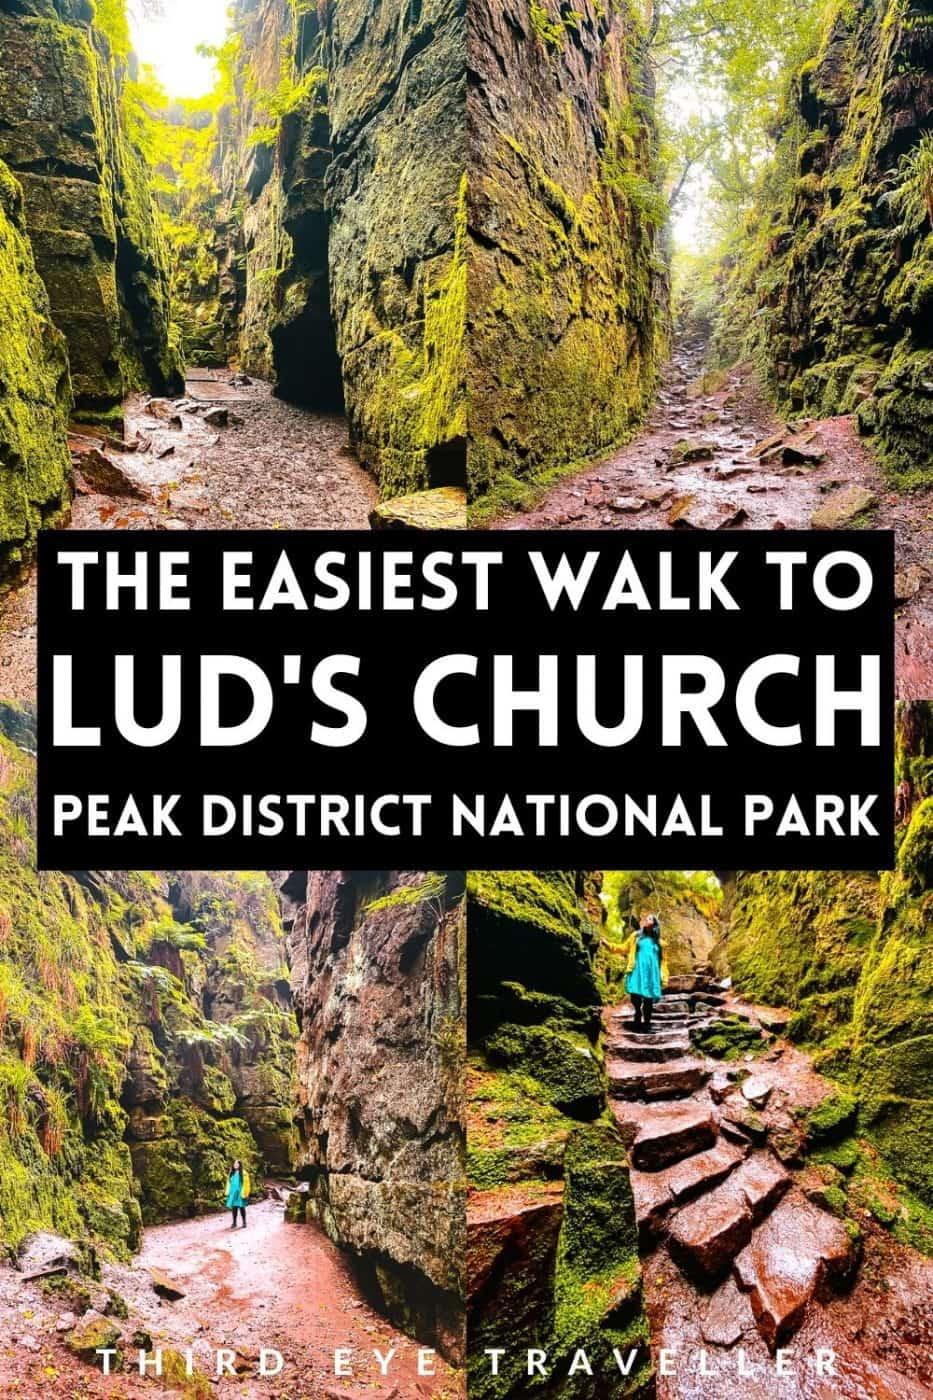 easy lud's church walk from gradbach peak district